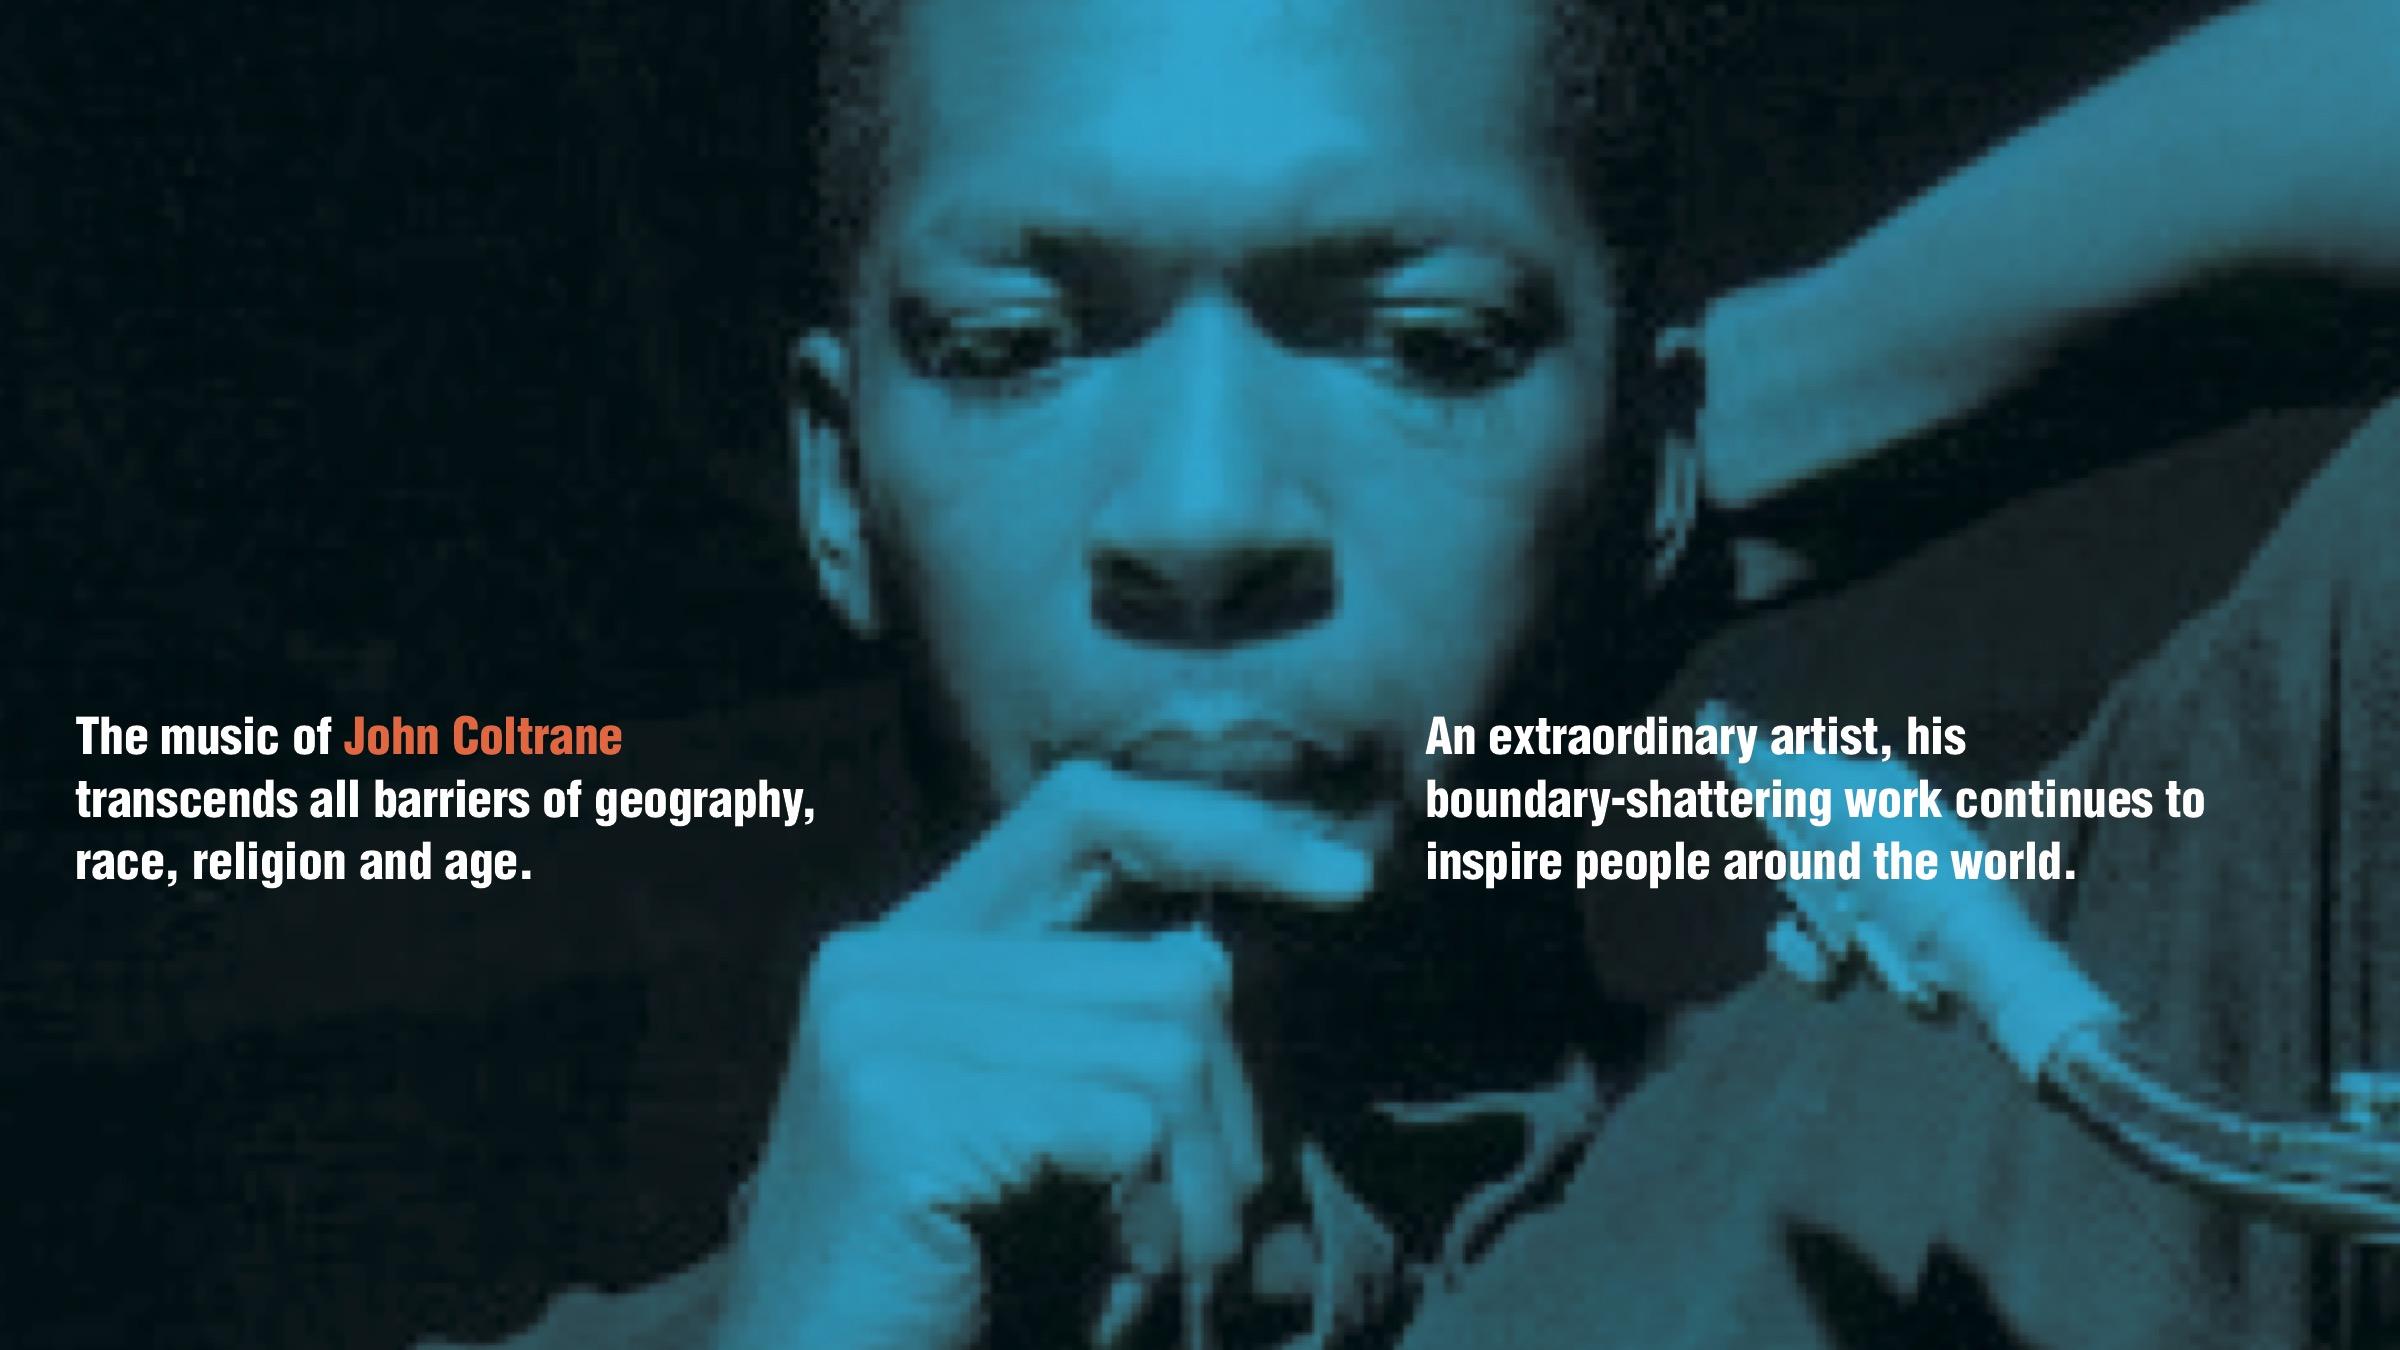 Coltrane_front 2.jpeg